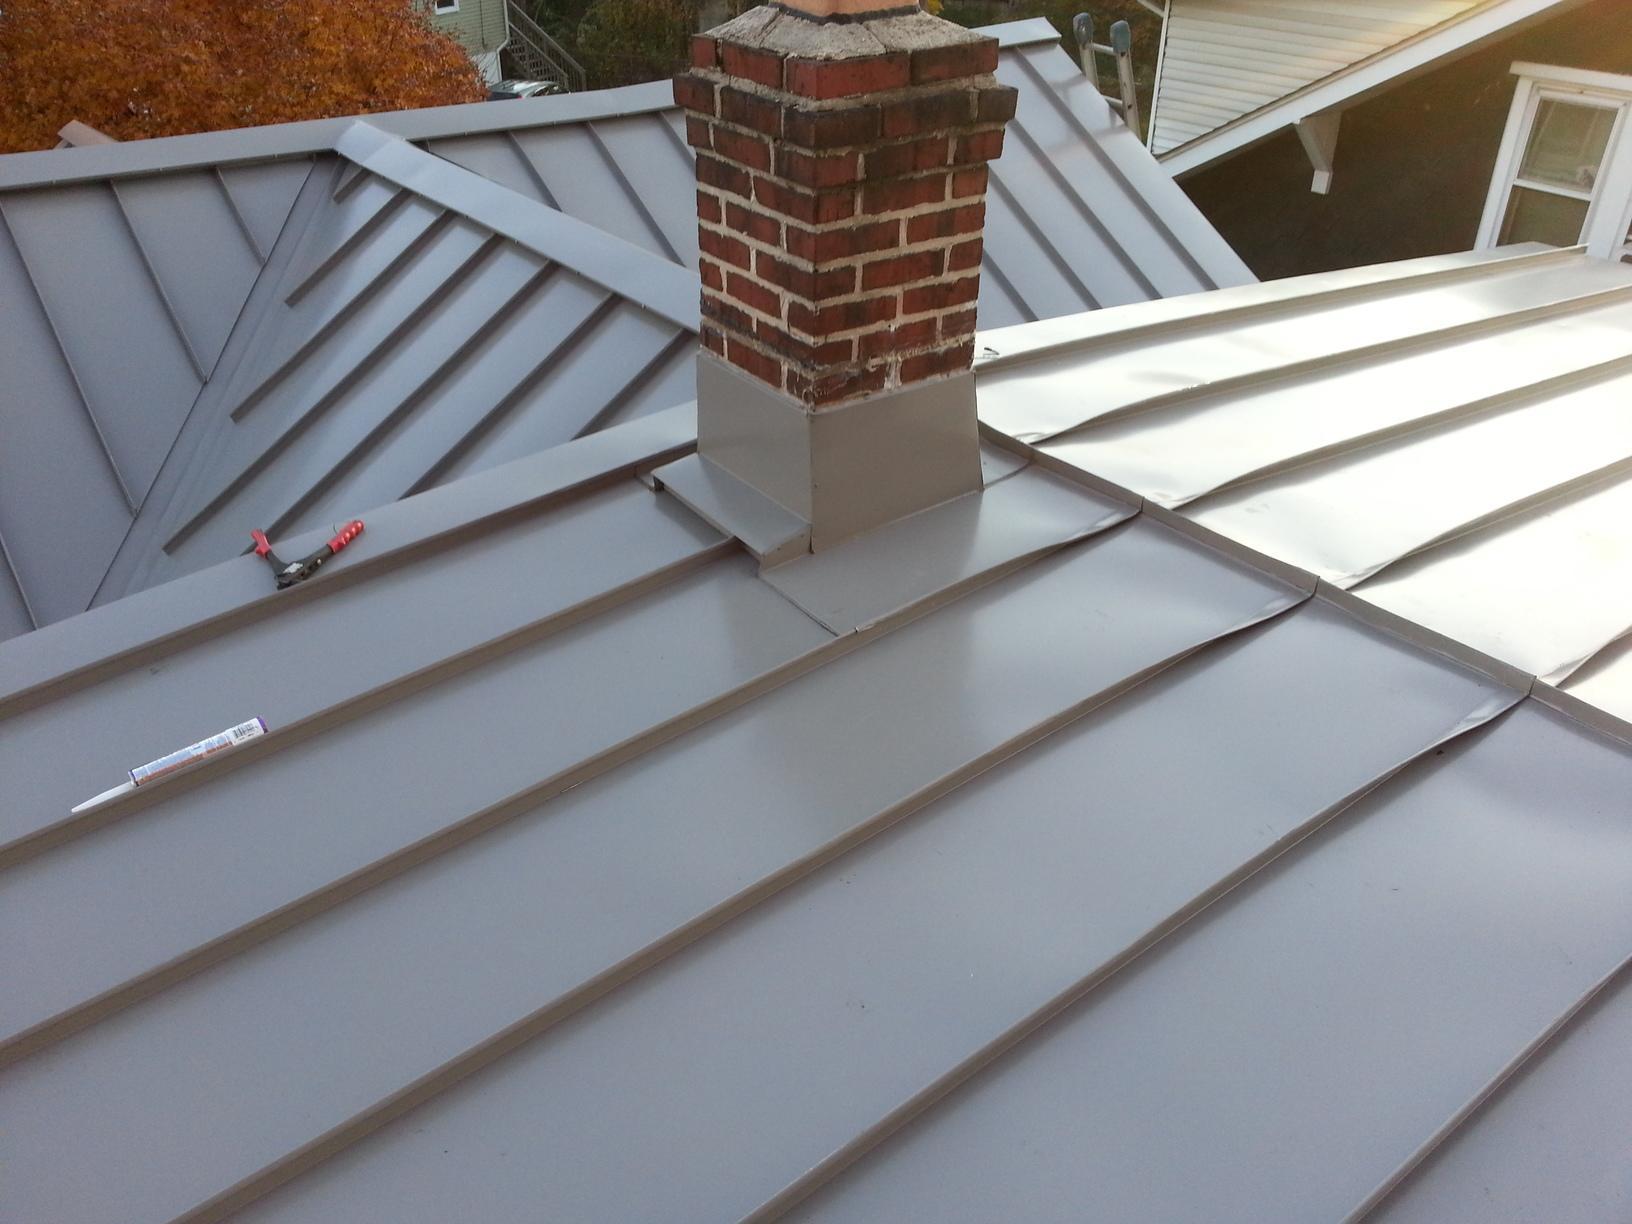 Standing Seam Metal Roof with Custom Chimney Flashing in Oaklyn, NJ